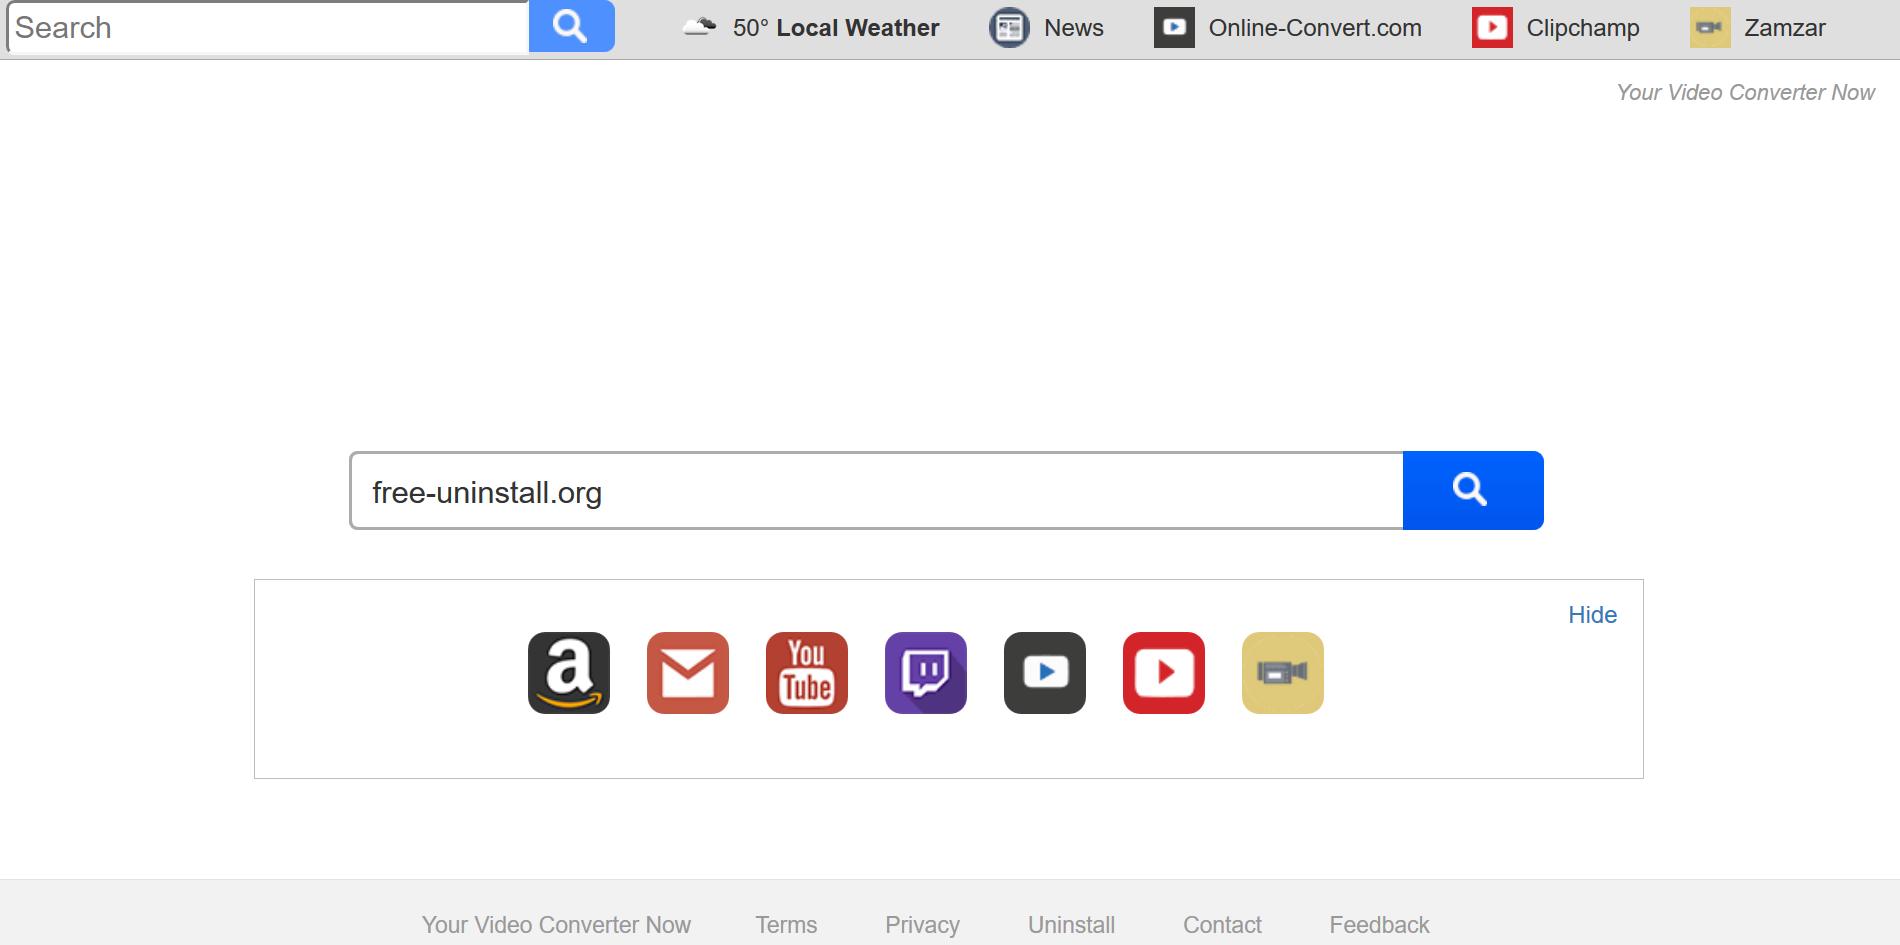 ads by Search.searchvidpop.com